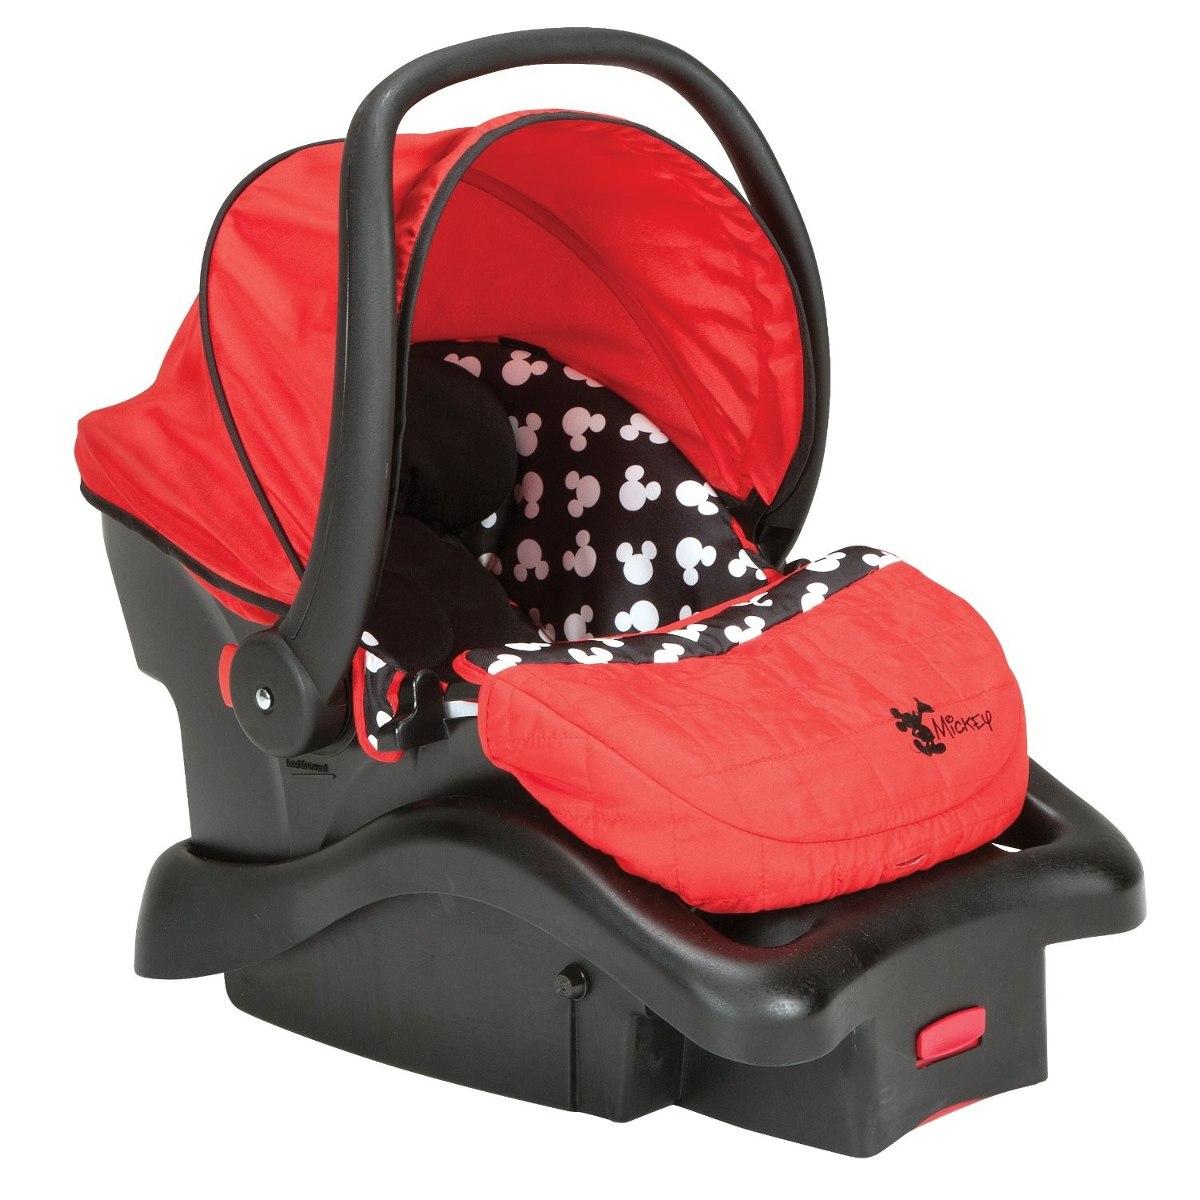 Portabebe mickey mouse base para auto bebe sillita carro for Coche con silla de auto